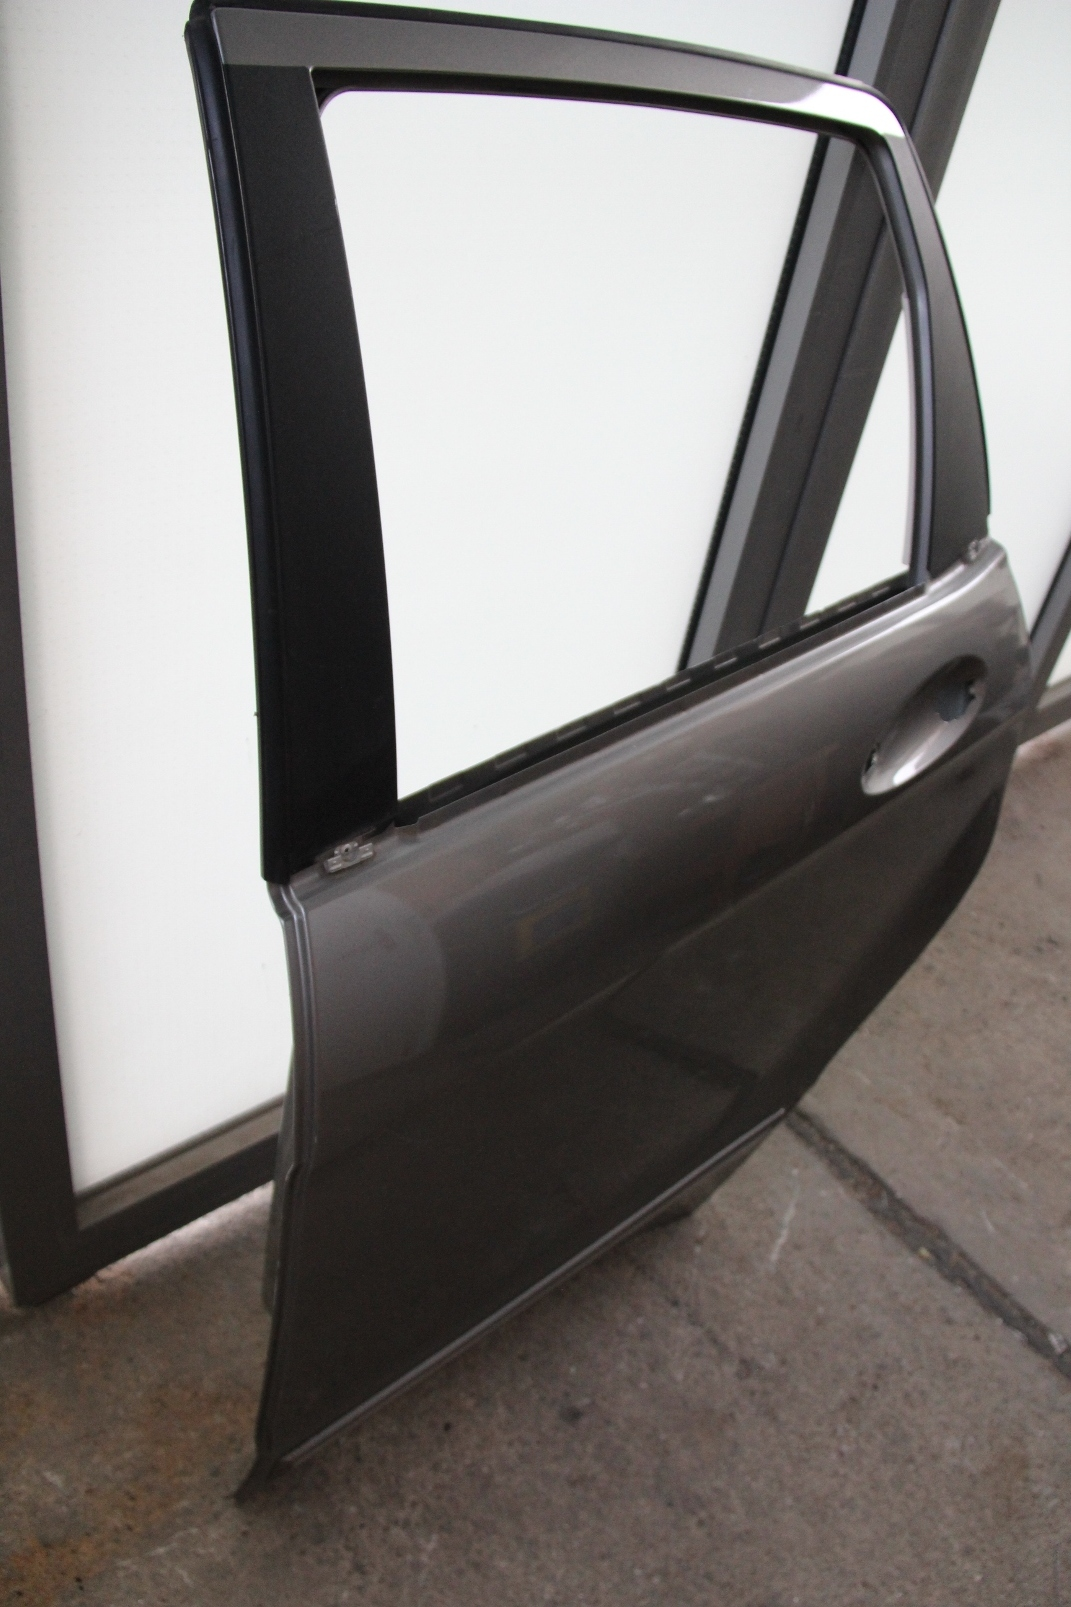 autot r hinten links original mercedes benz b klasse w245 braun t r karosserie ebay. Black Bedroom Furniture Sets. Home Design Ideas